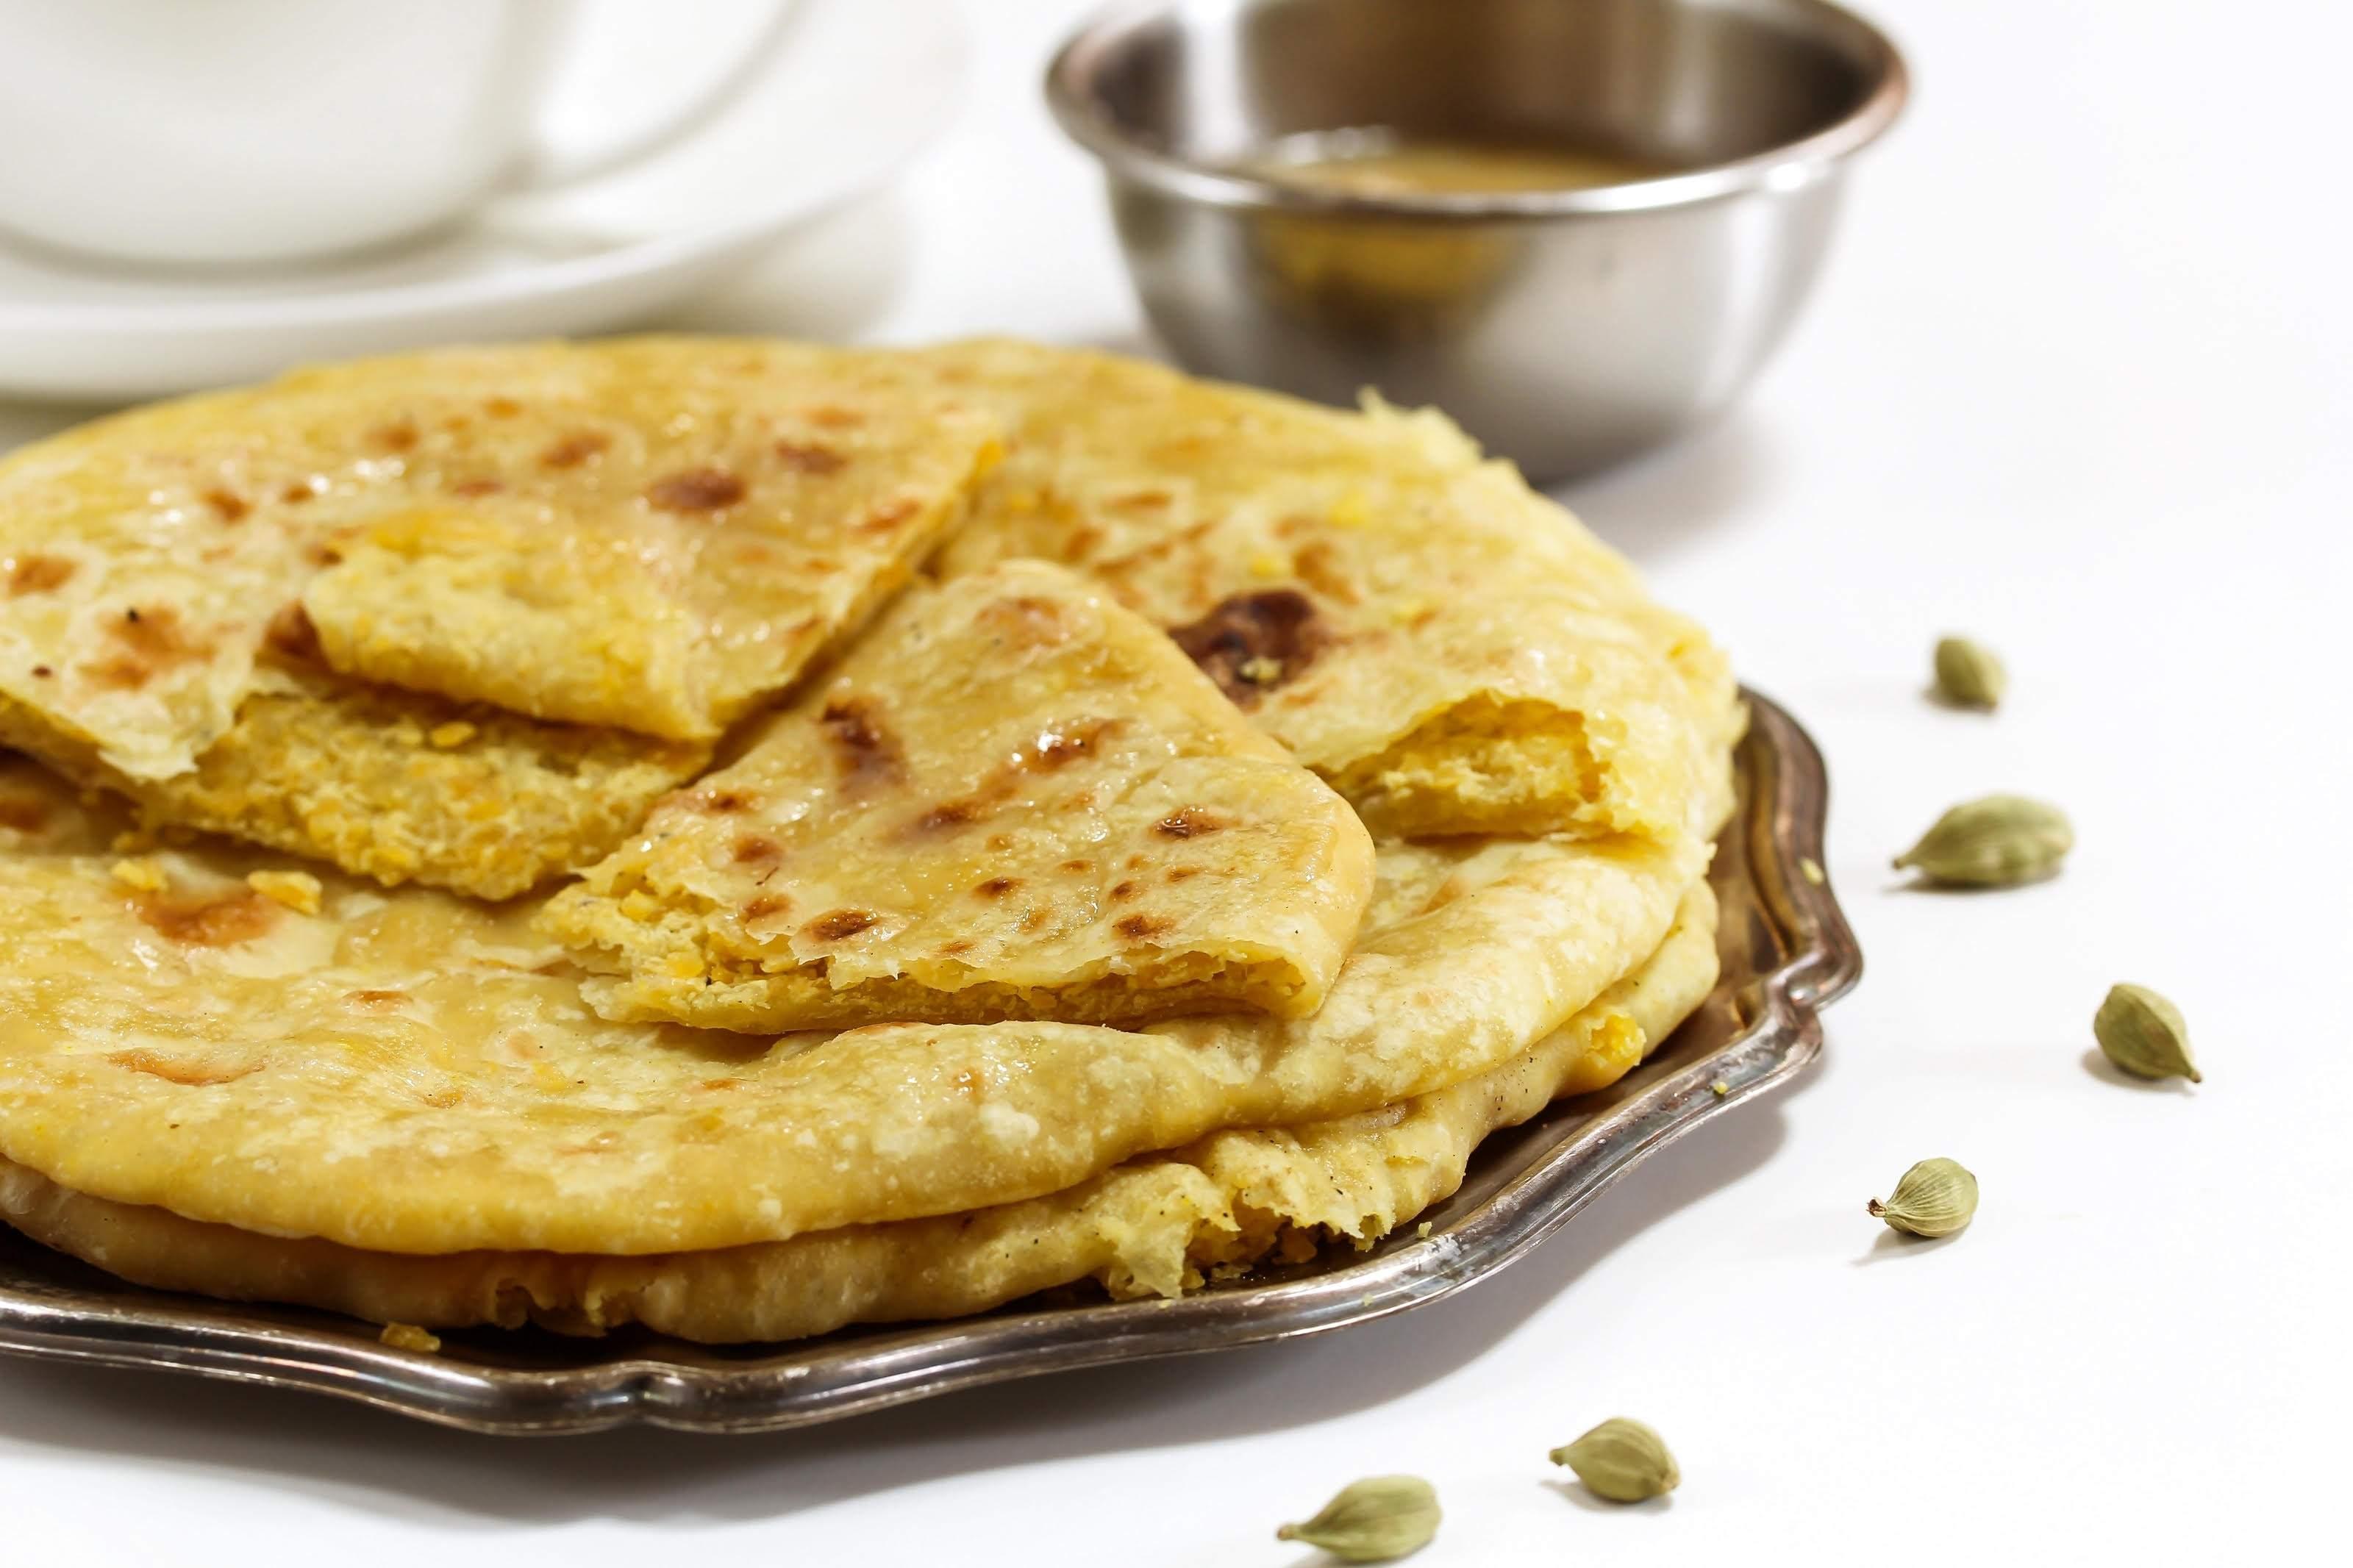 Vasant-Panchami-Festival-Food-Puran-Poli